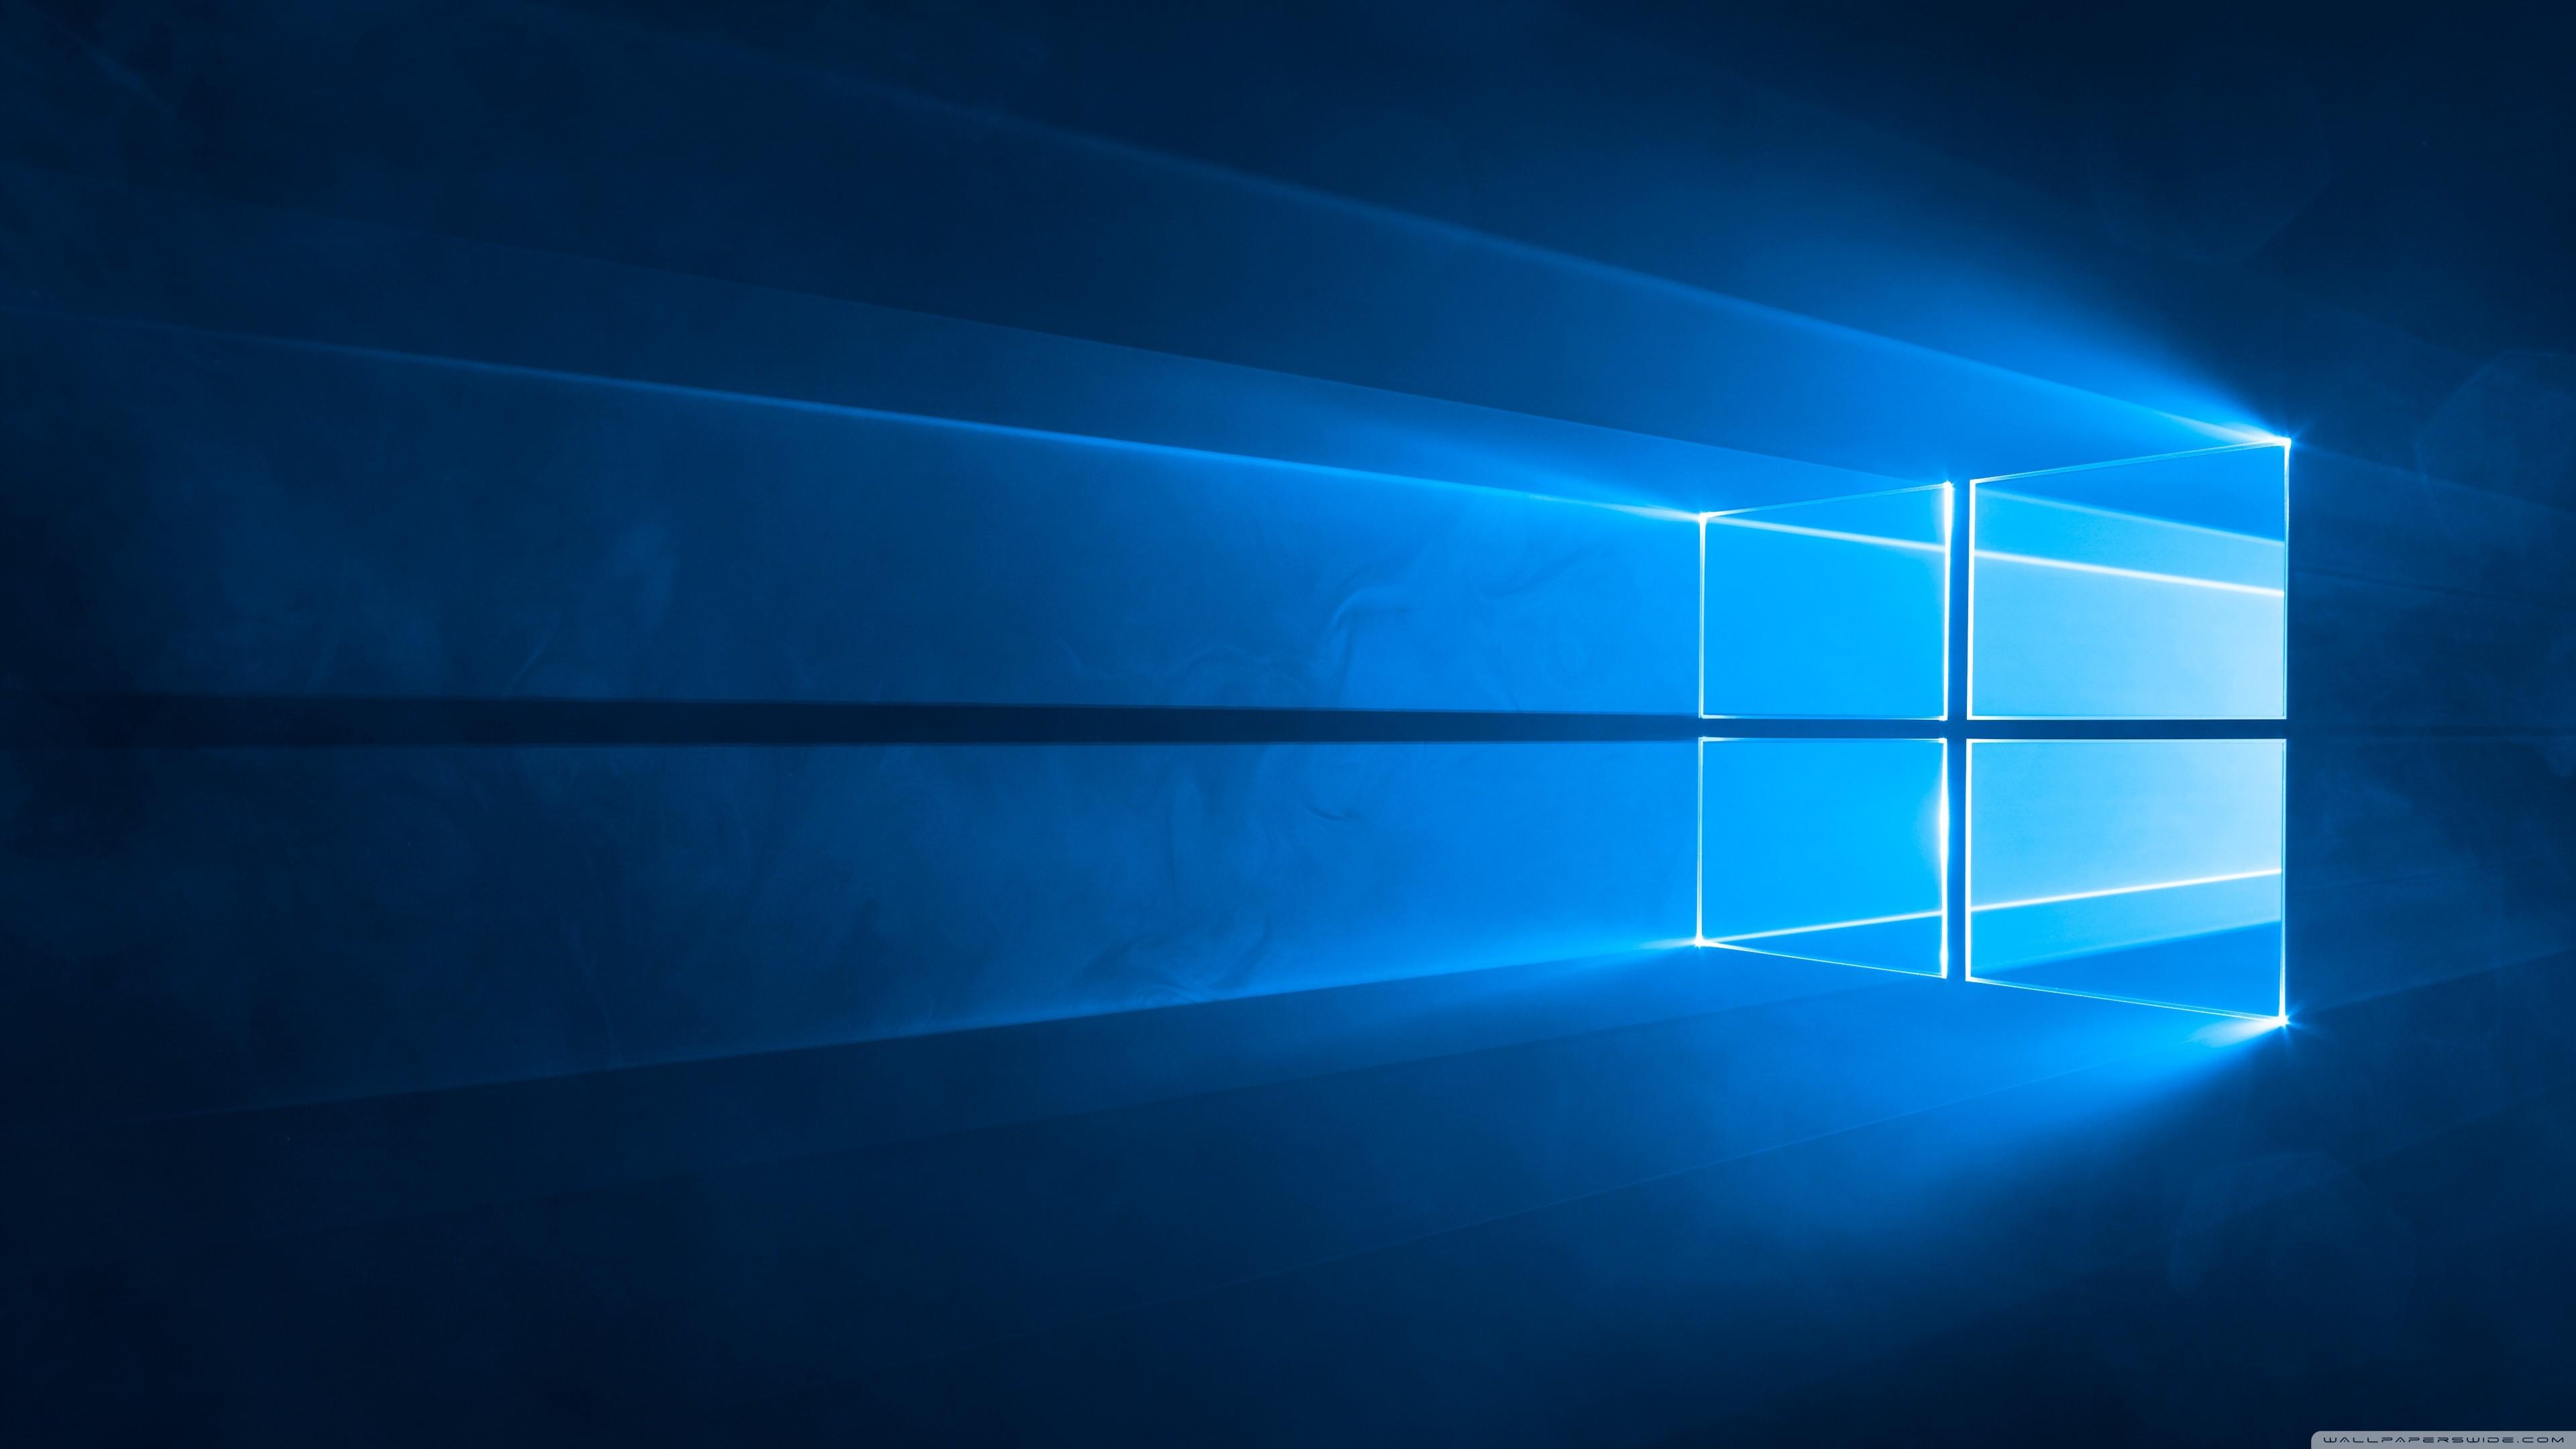 Windows 10 Hero 4K HD Wide Wallpaper for Widescreen